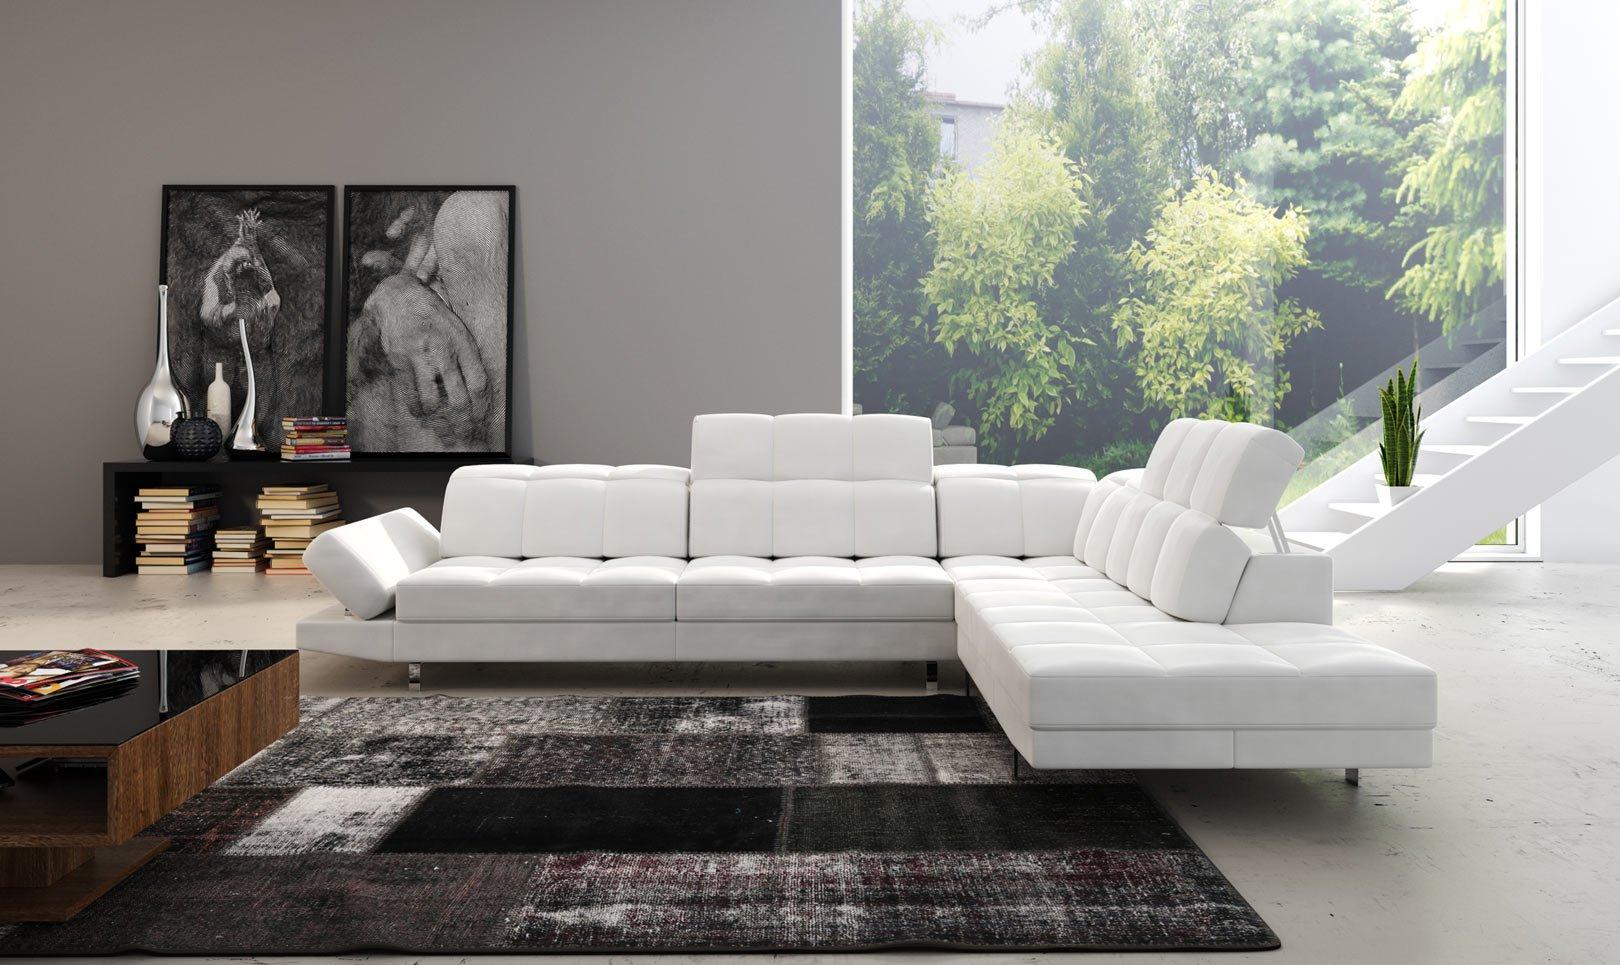 meble wypoczynkowe warszawa oryginalny naro nik z funkcj spania. Black Bedroom Furniture Sets. Home Design Ideas